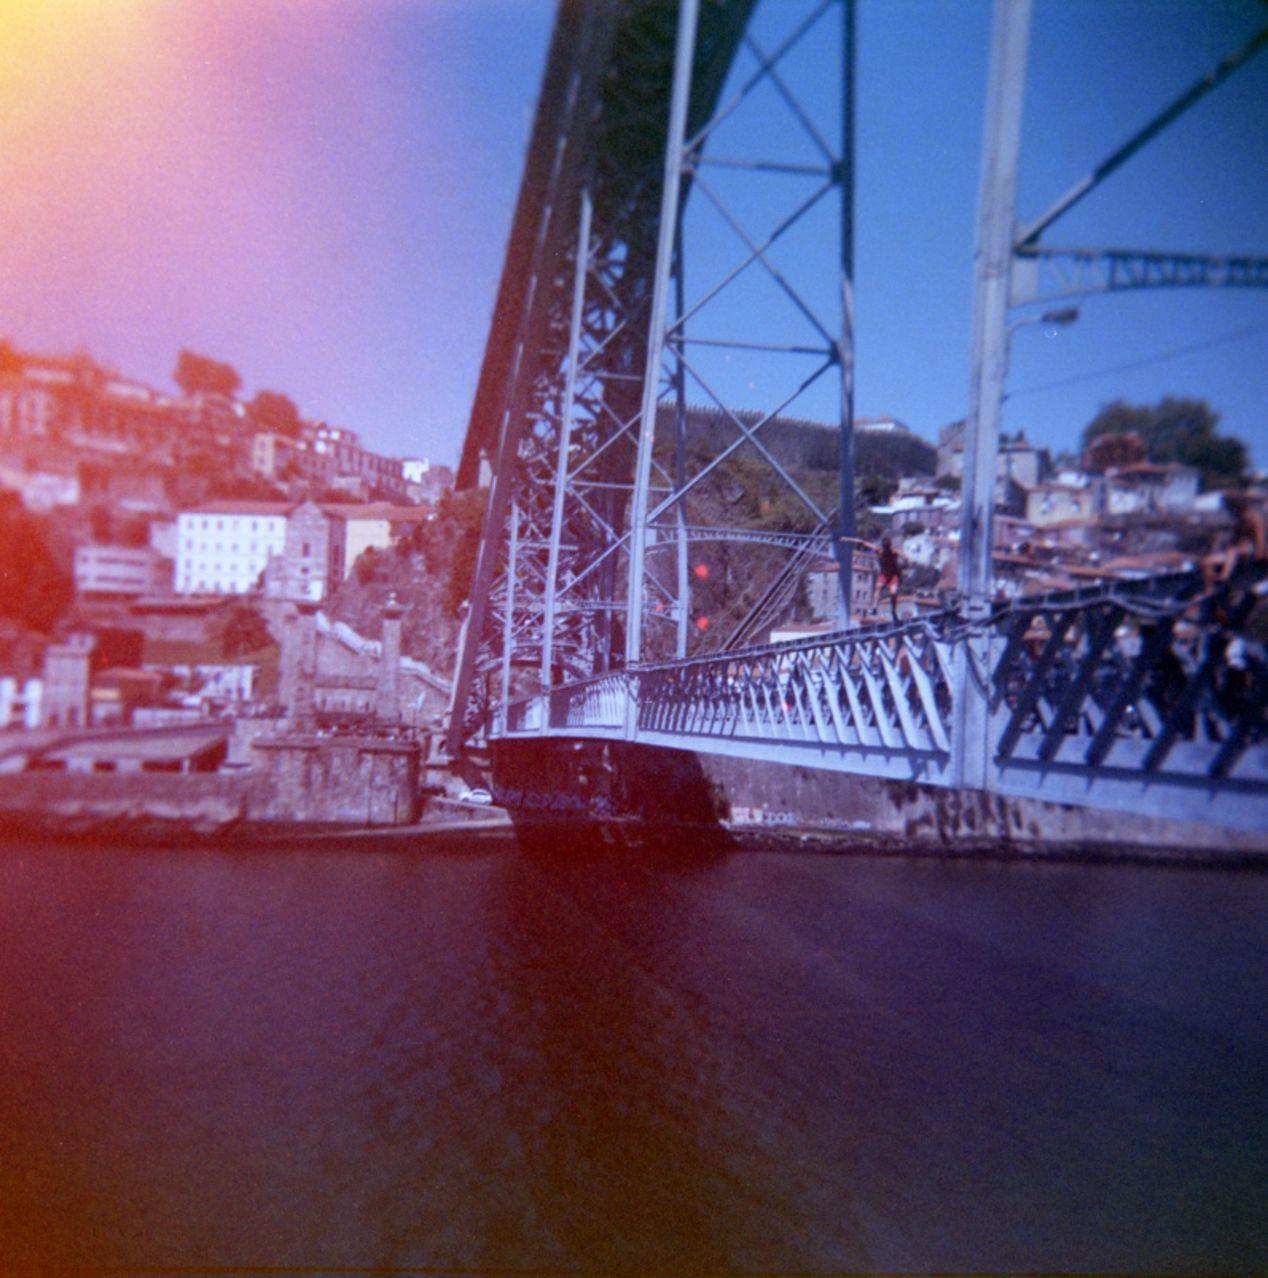 Ponte D. Luís I. Holga 120.